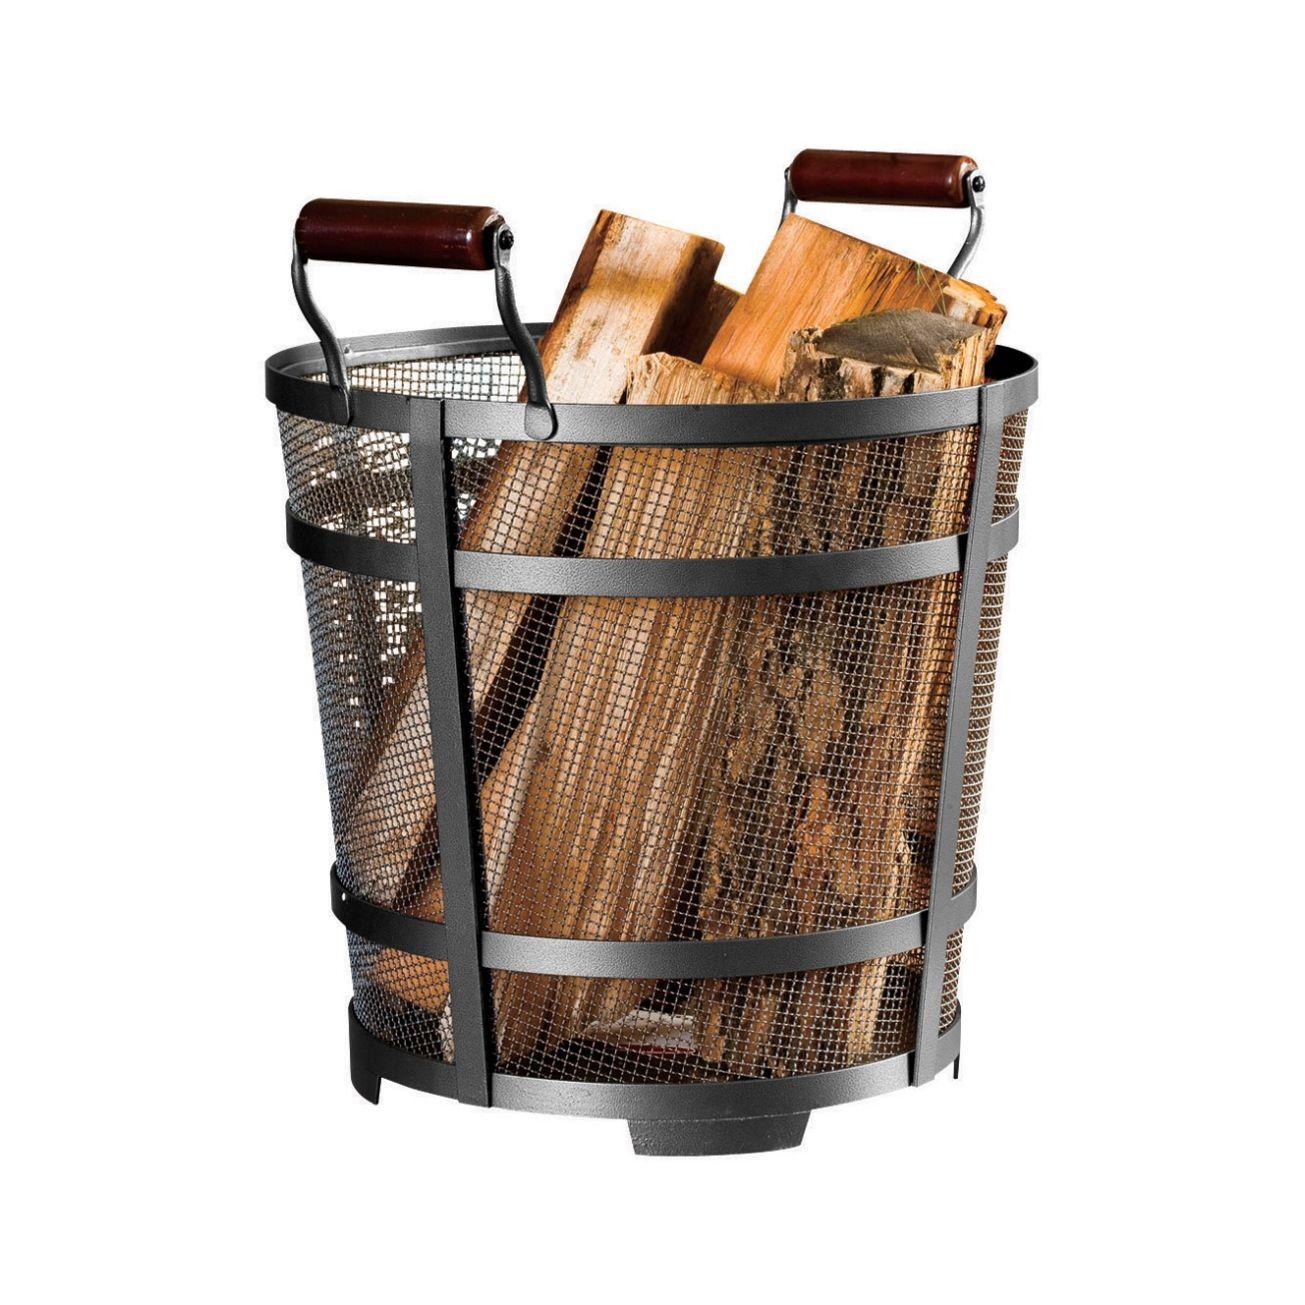 Best 25+ Indoor log holder ideas on Pinterest | Log holder ...